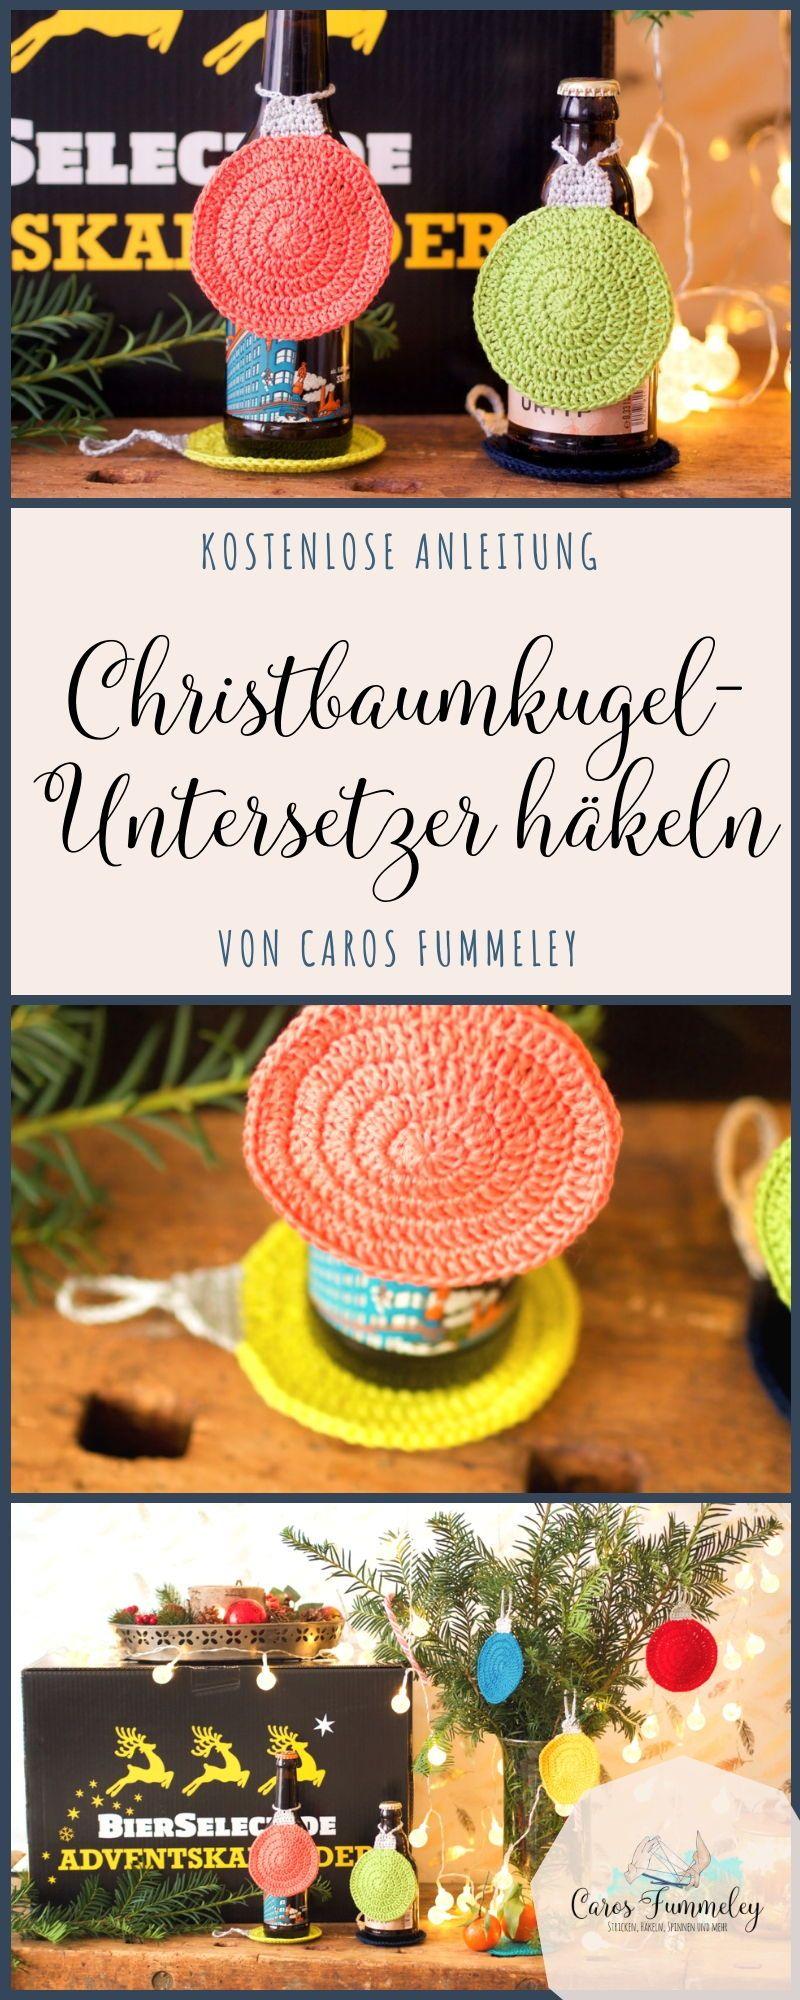 [Anzeige] Christbaumkugel-Untersetzer häkeln #crochetedearrings